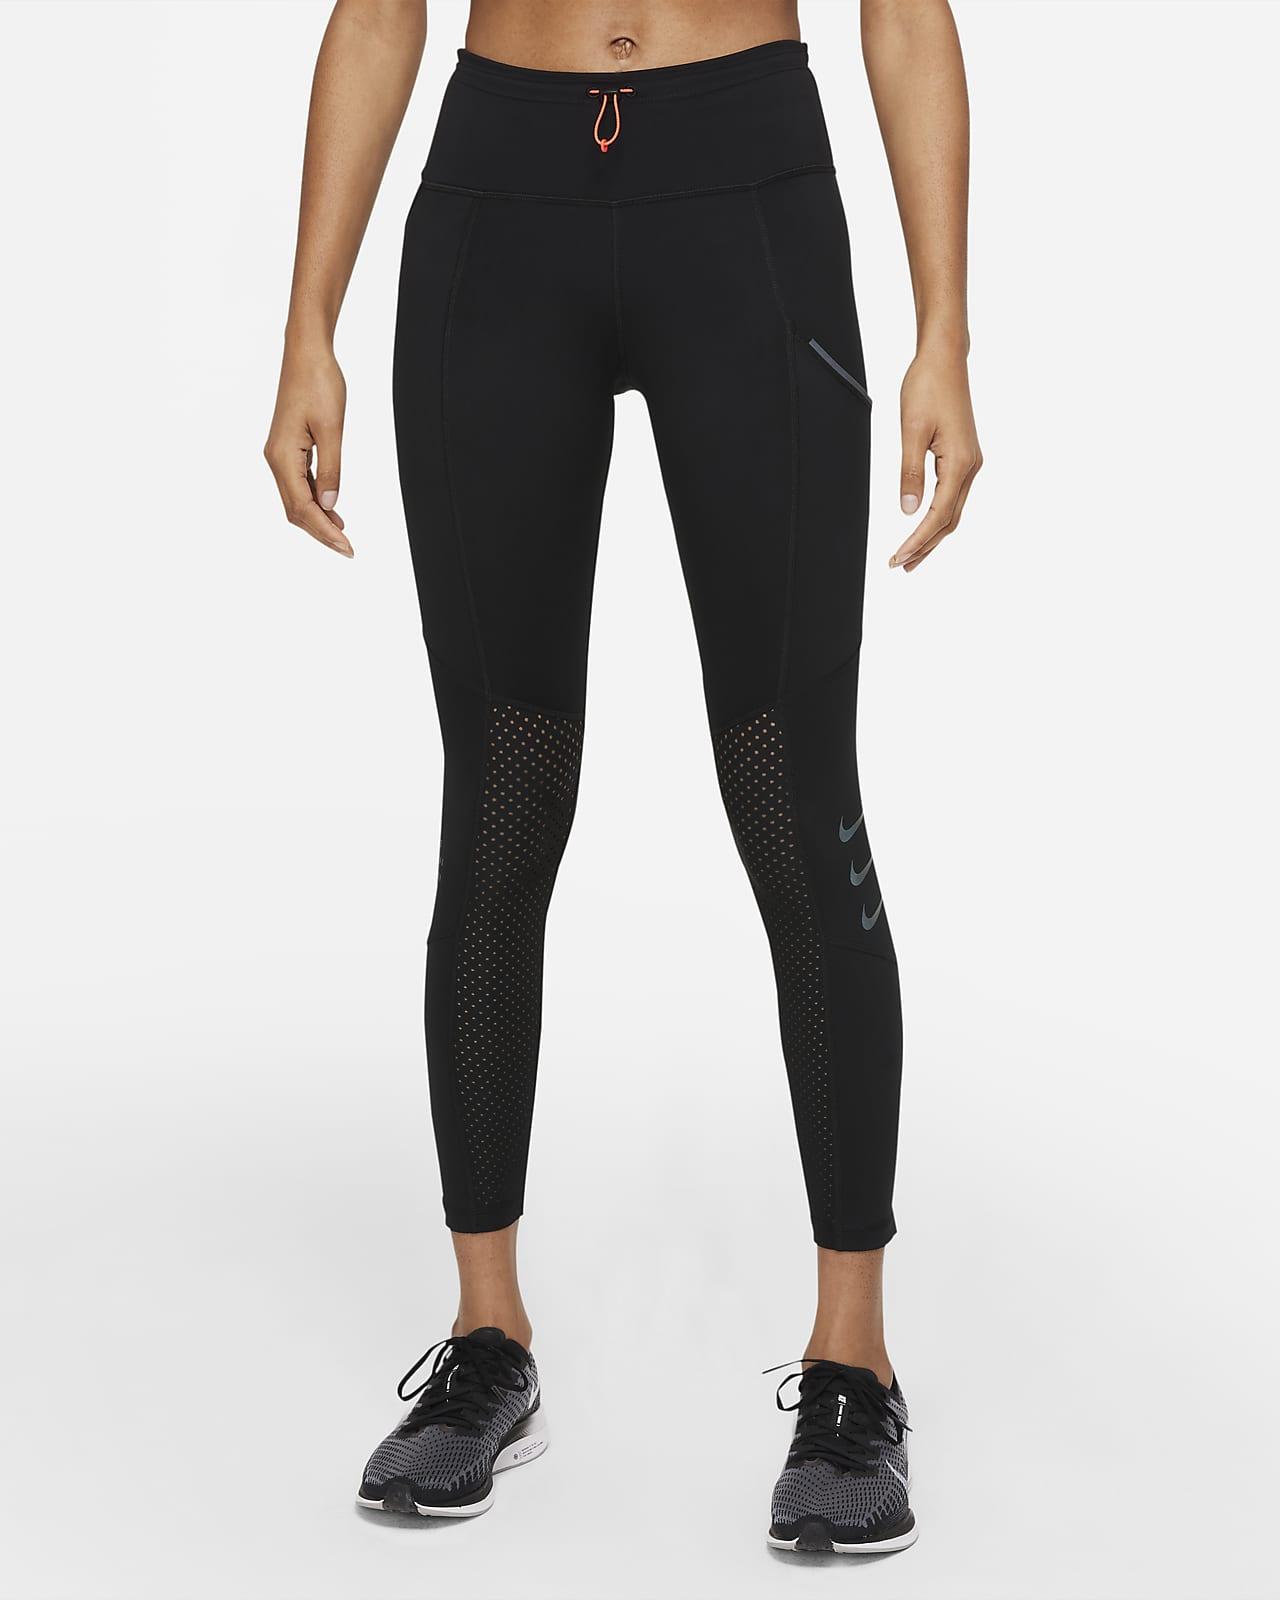 Legging de running 7/8 taille mi-haute Nike Dri-FIT ADV Run Division Epic Luxe pour Femme